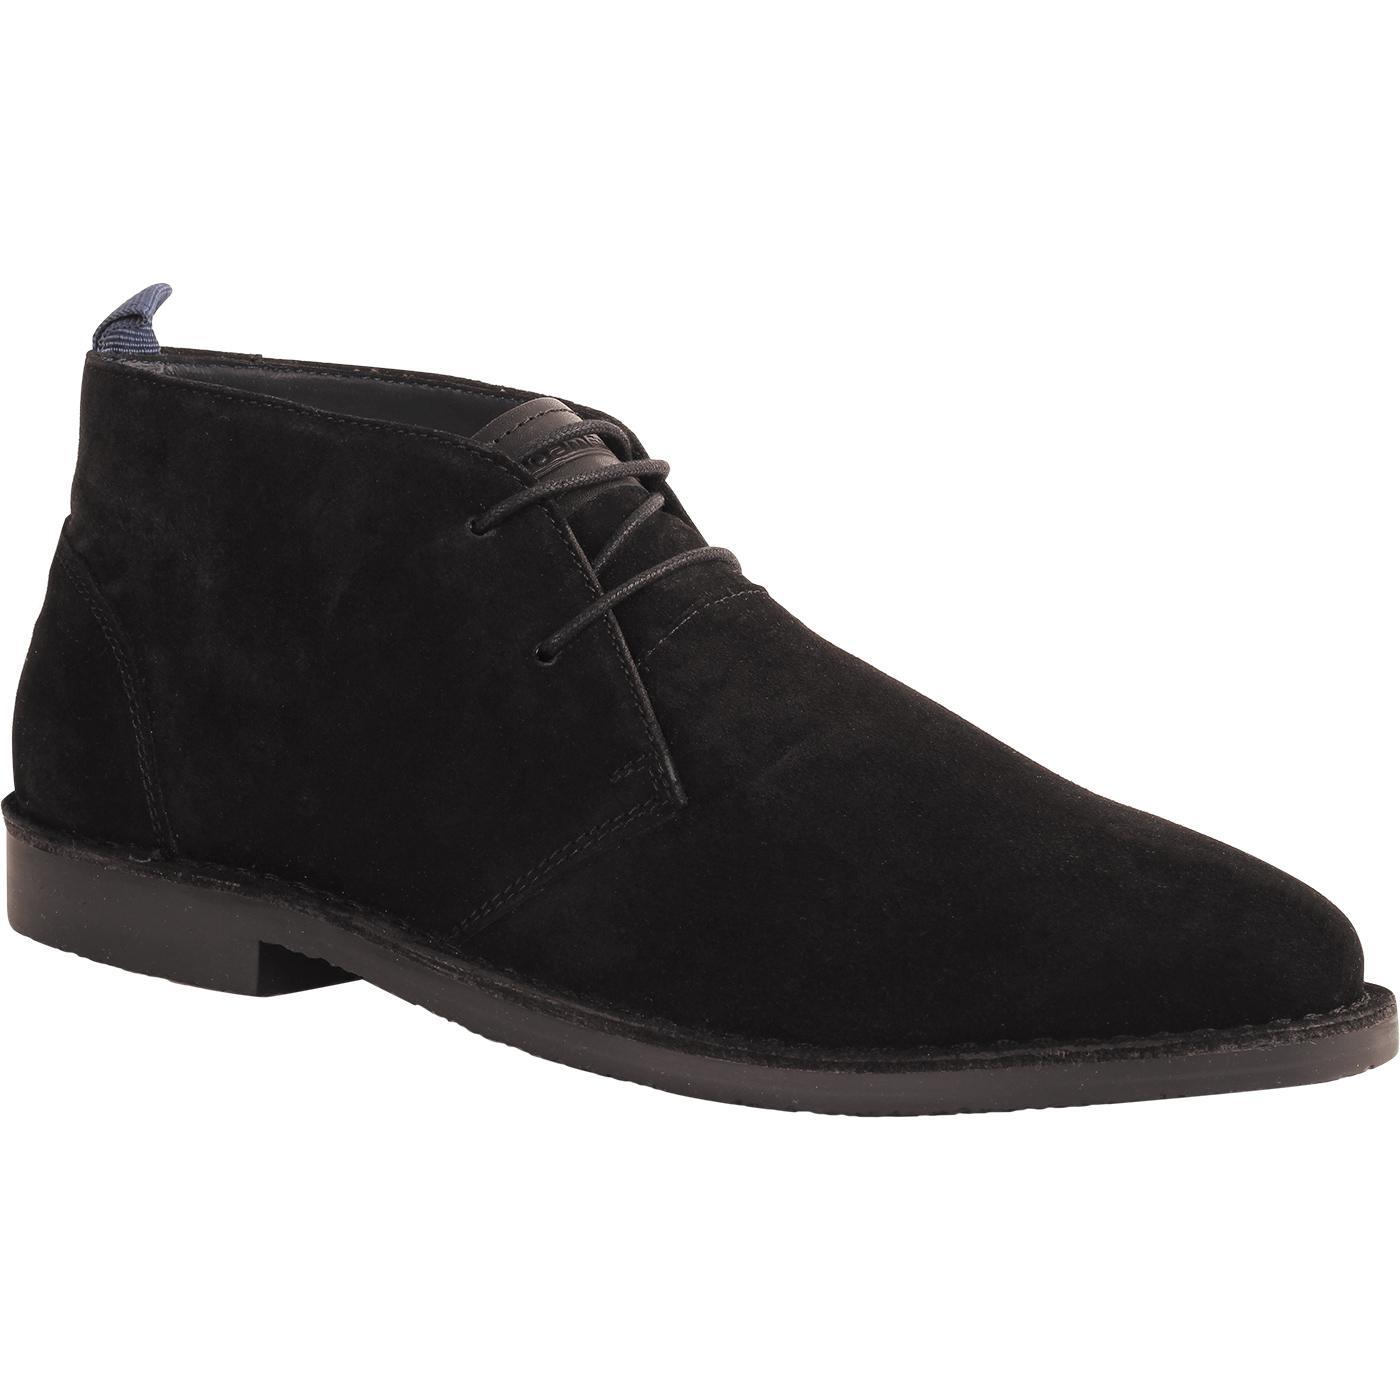 Men's Retro Mod Classic Suede Desert Boots (Black)